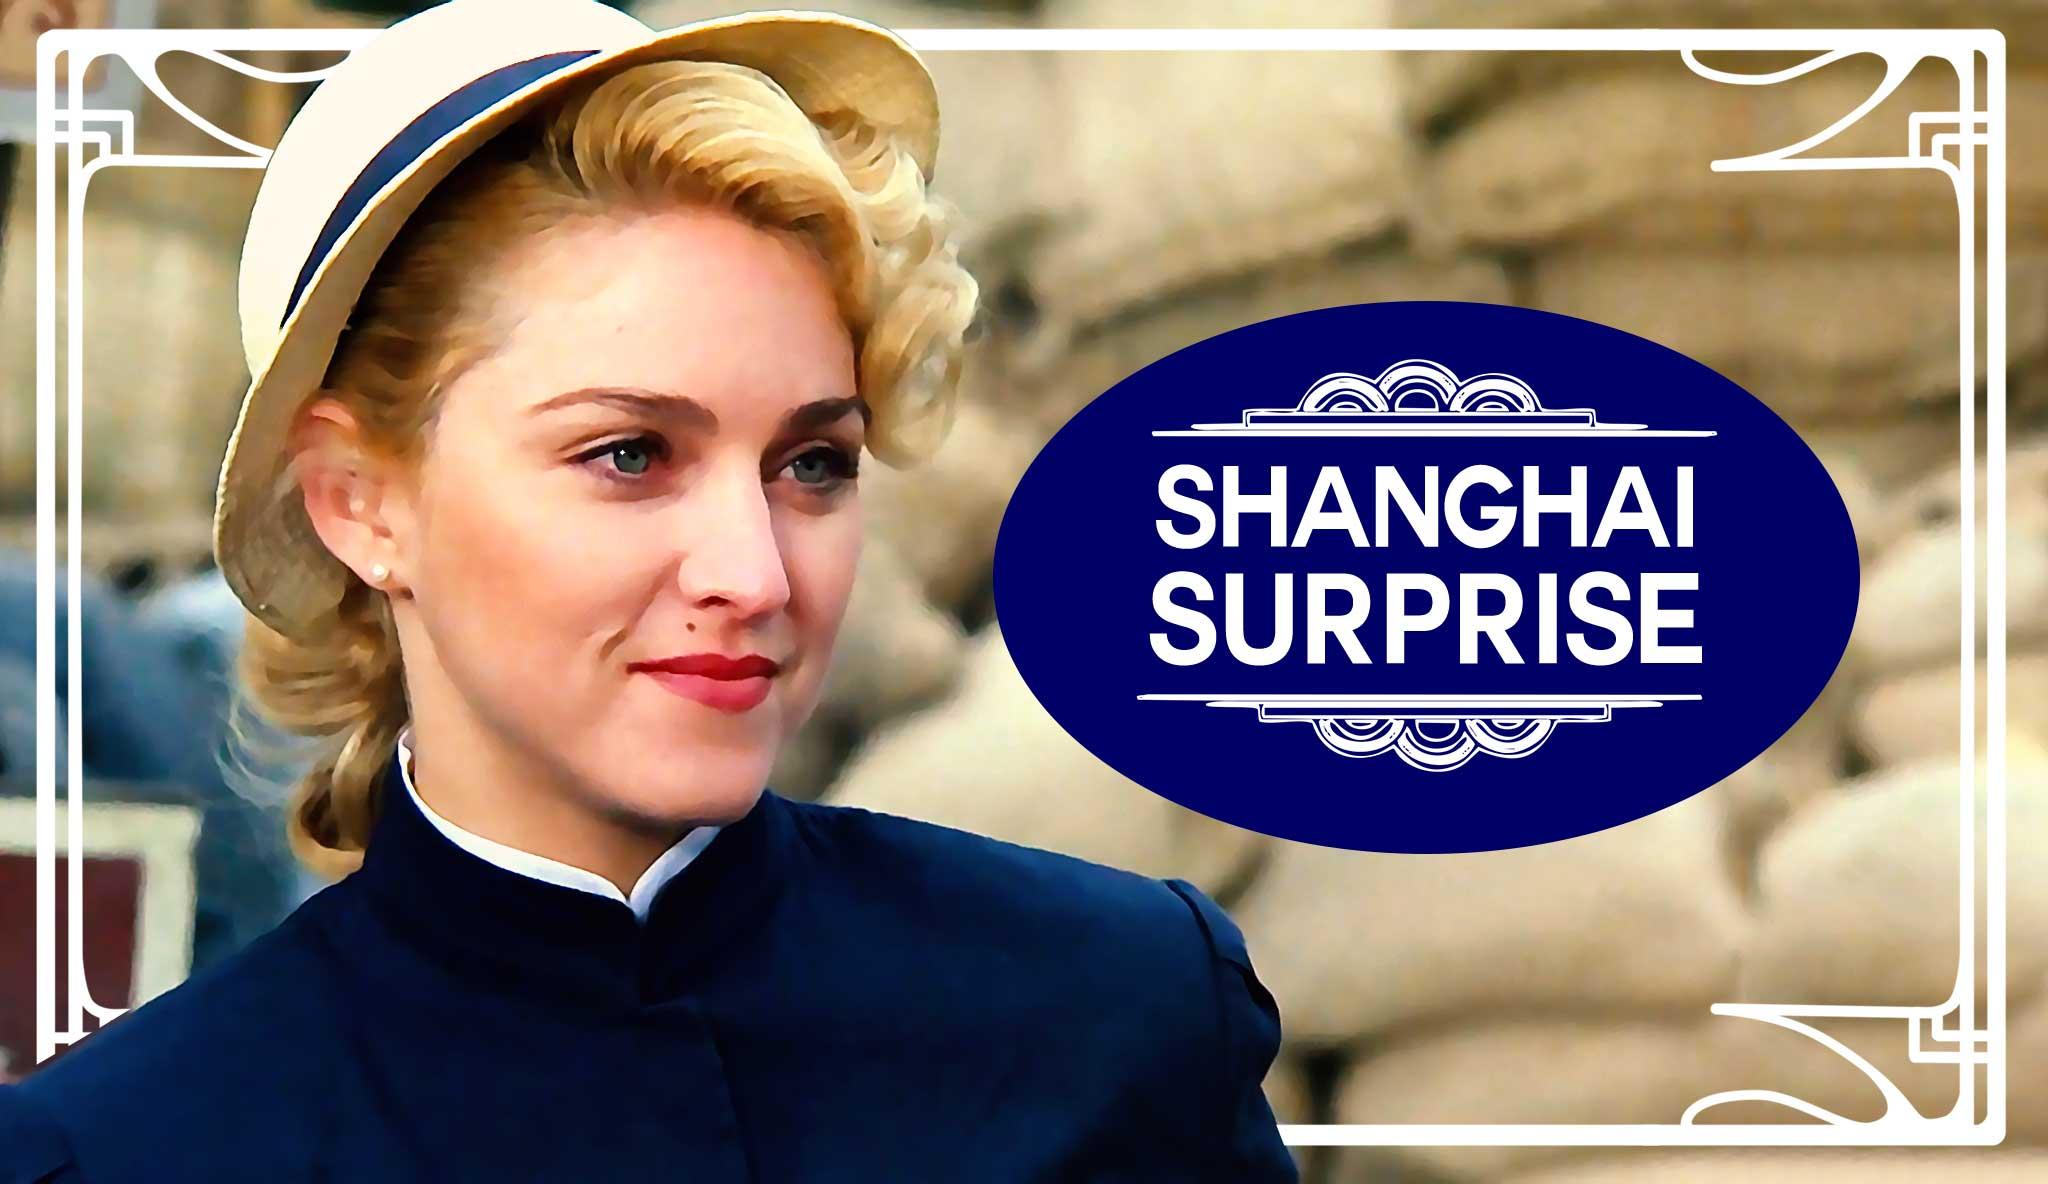 shanghai-surprise\header.jpg